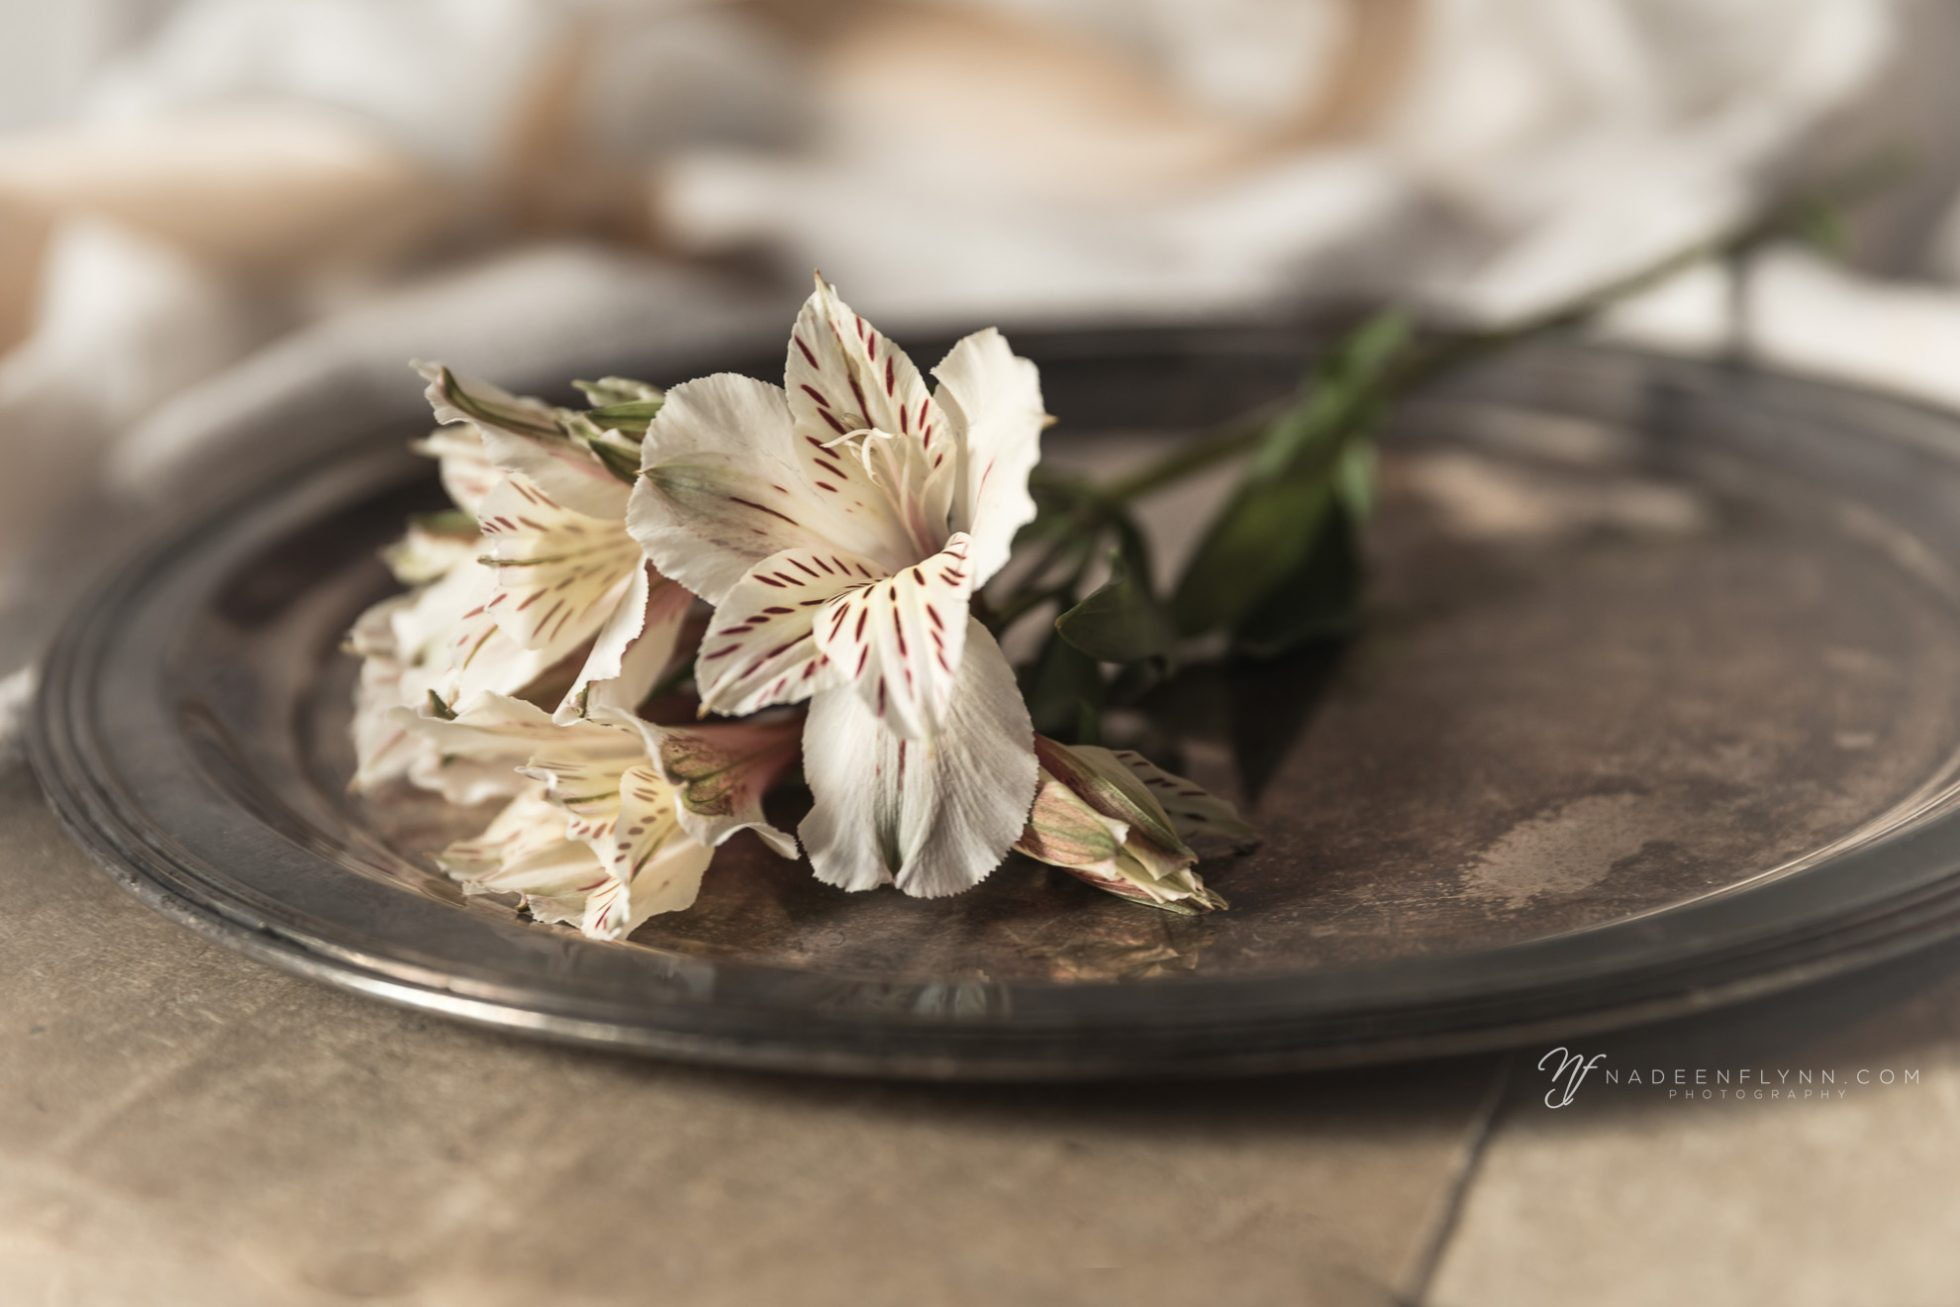 plated alstroemeria on silver platter